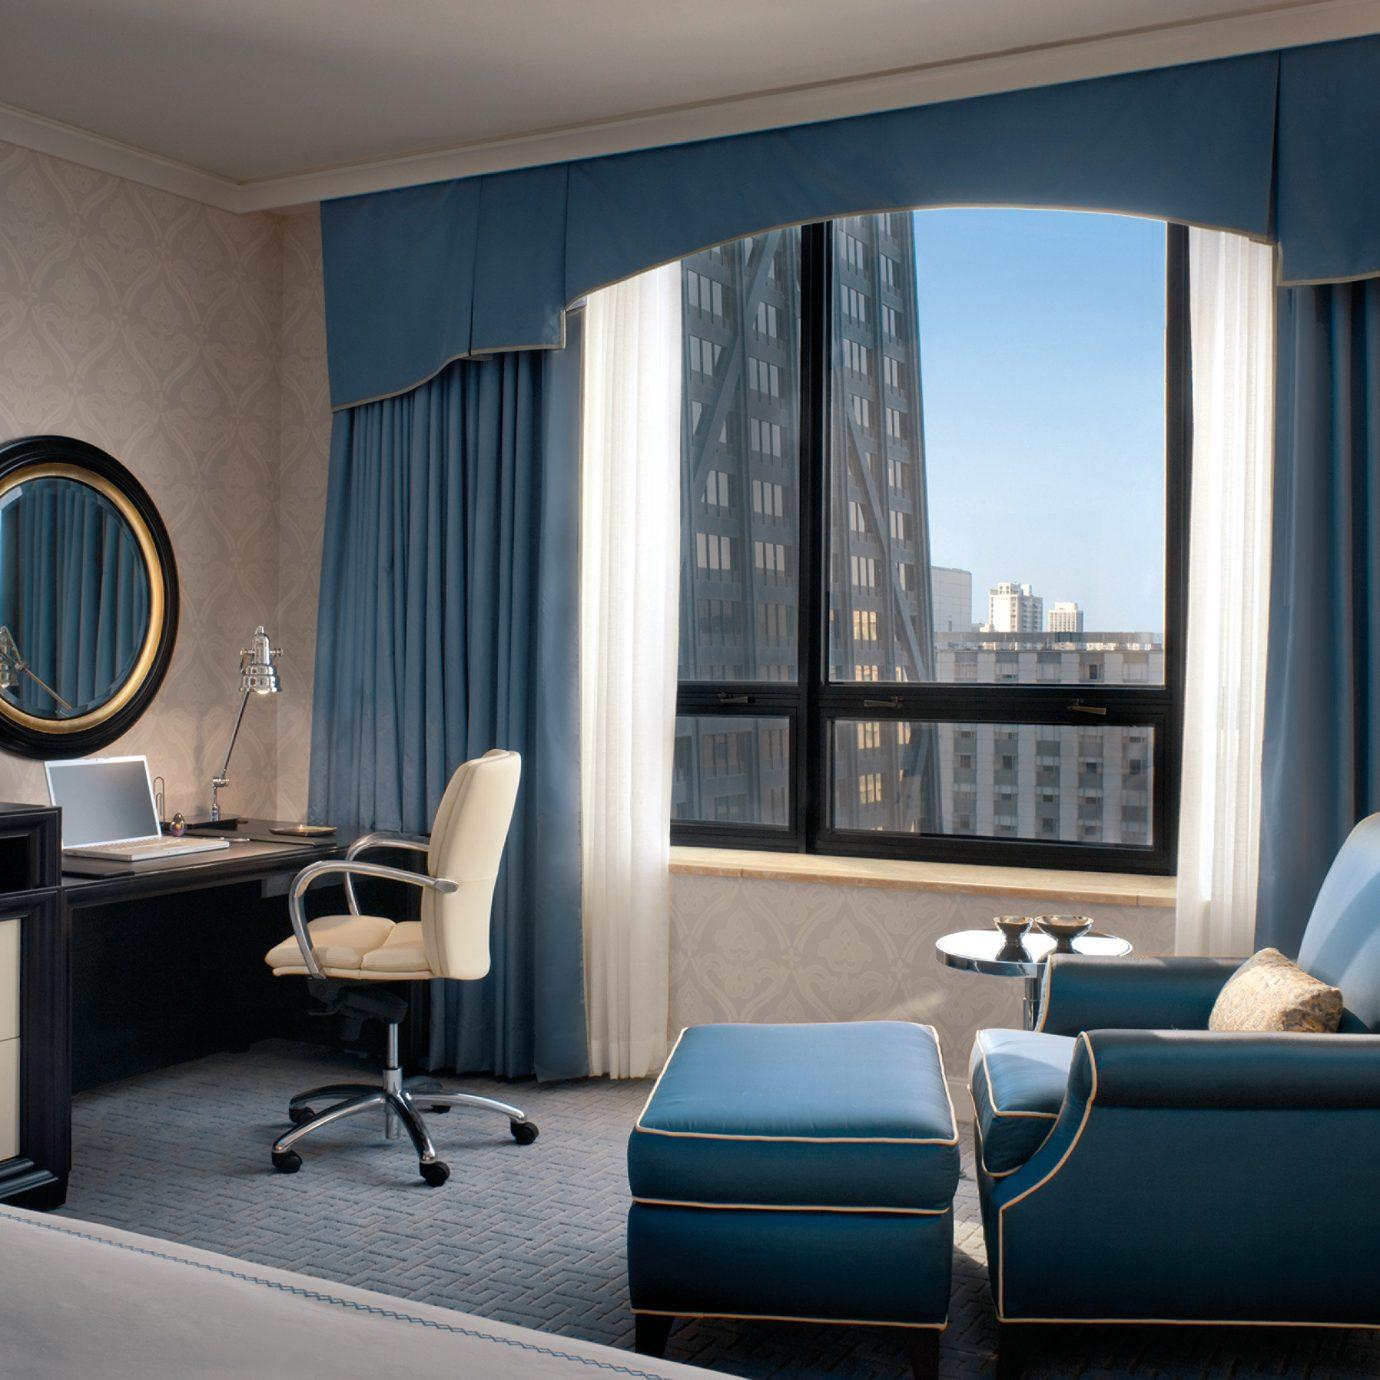 Hip Lounge Luxury Modern sofa living room property home Suite Bedroom window treatment flat